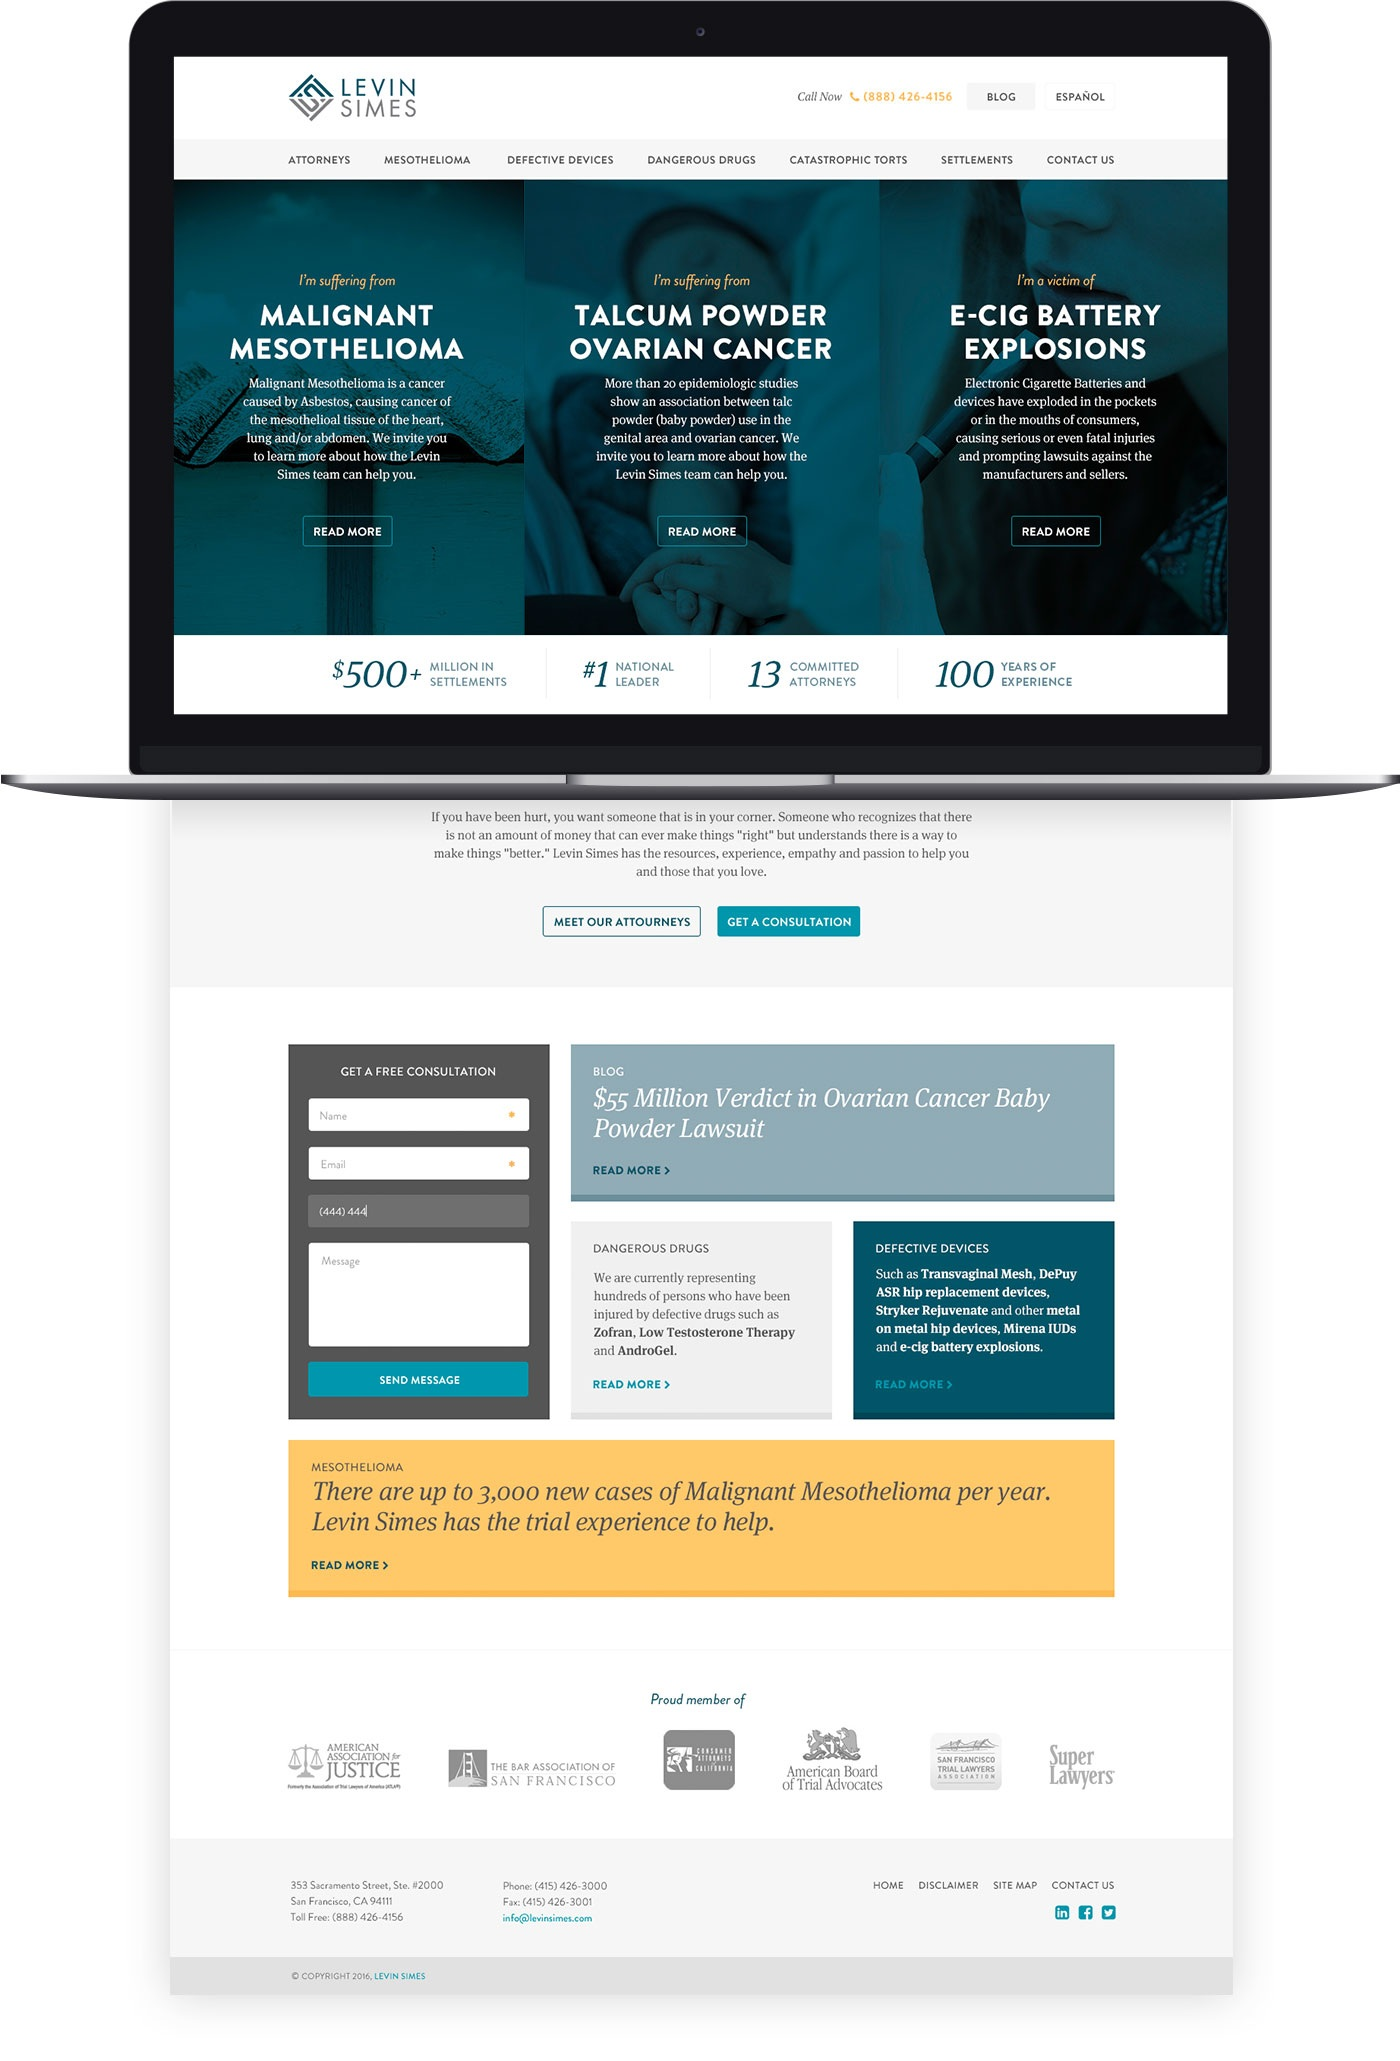 design-levinsimes.jpg